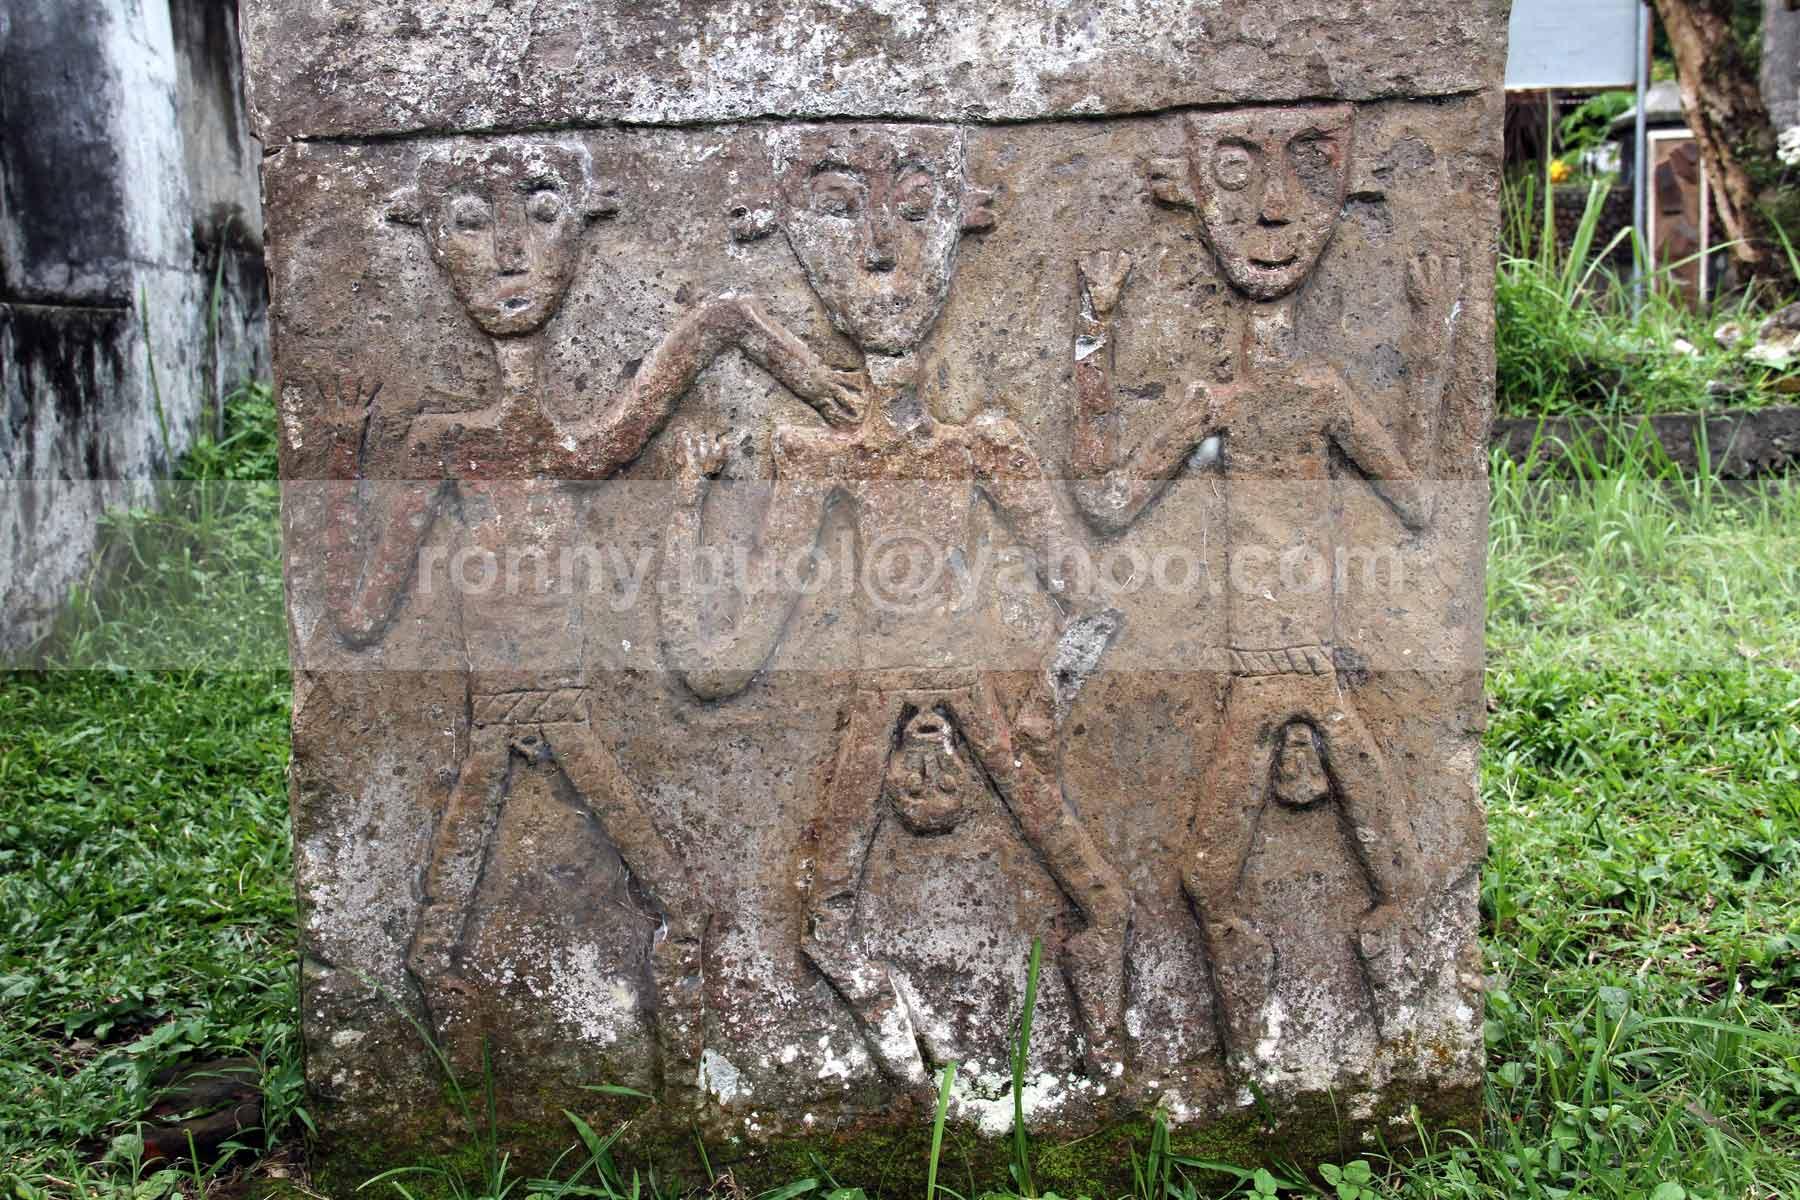 Foto Waruga Warisan Leluhur Minahasa Blog Ronny Buol Relief Situs